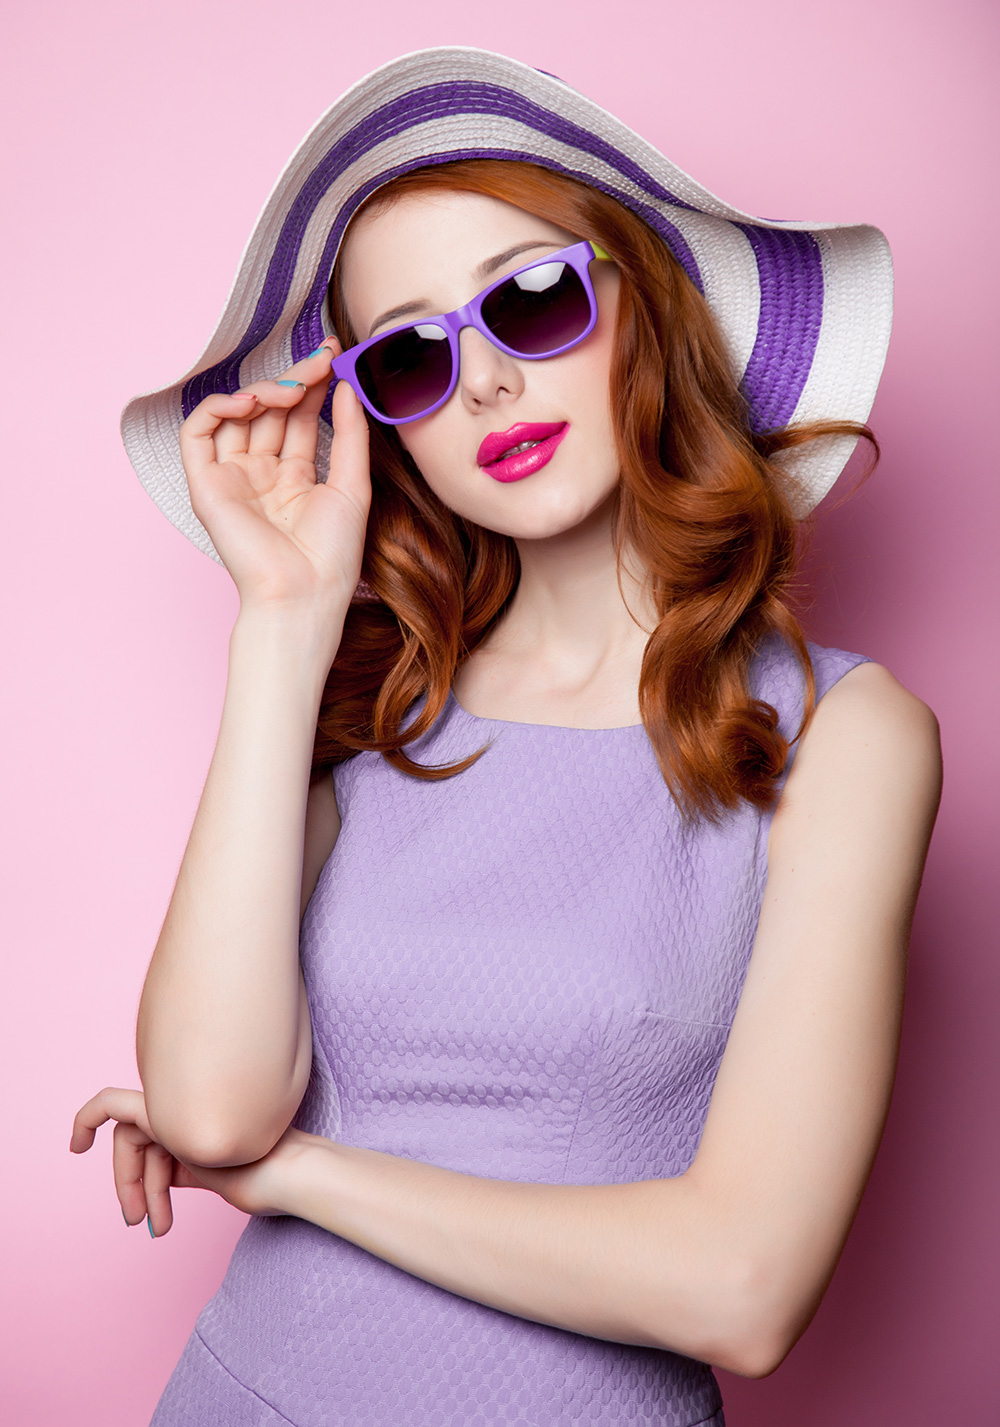 Girl wearing purple hat, purple sunglasses and purple dress